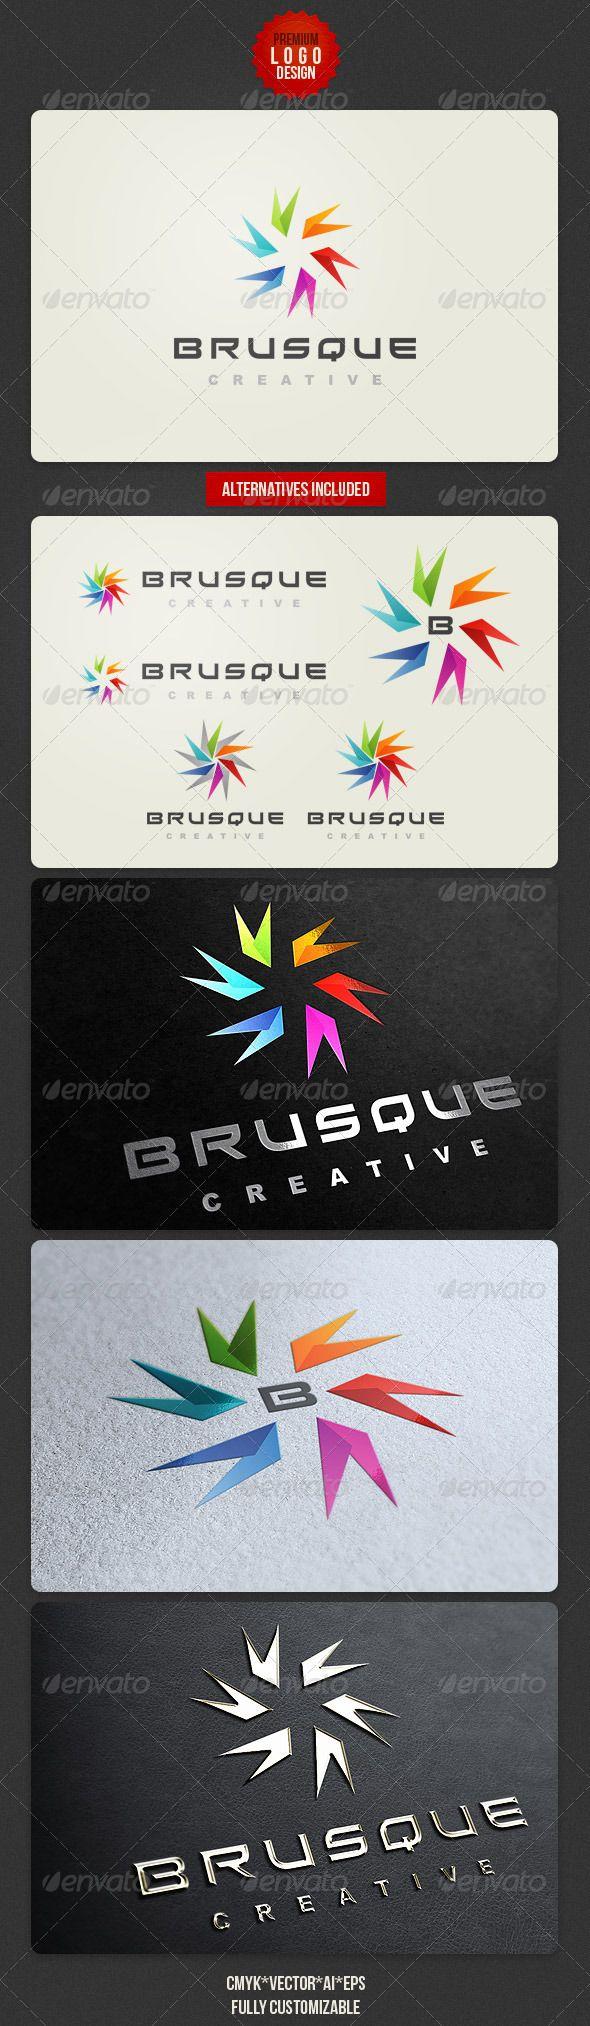 Colorful Modern Logo Design - http://graphicriver.net/item/colorful-modern-logo-design/3006074?ref=cruzine